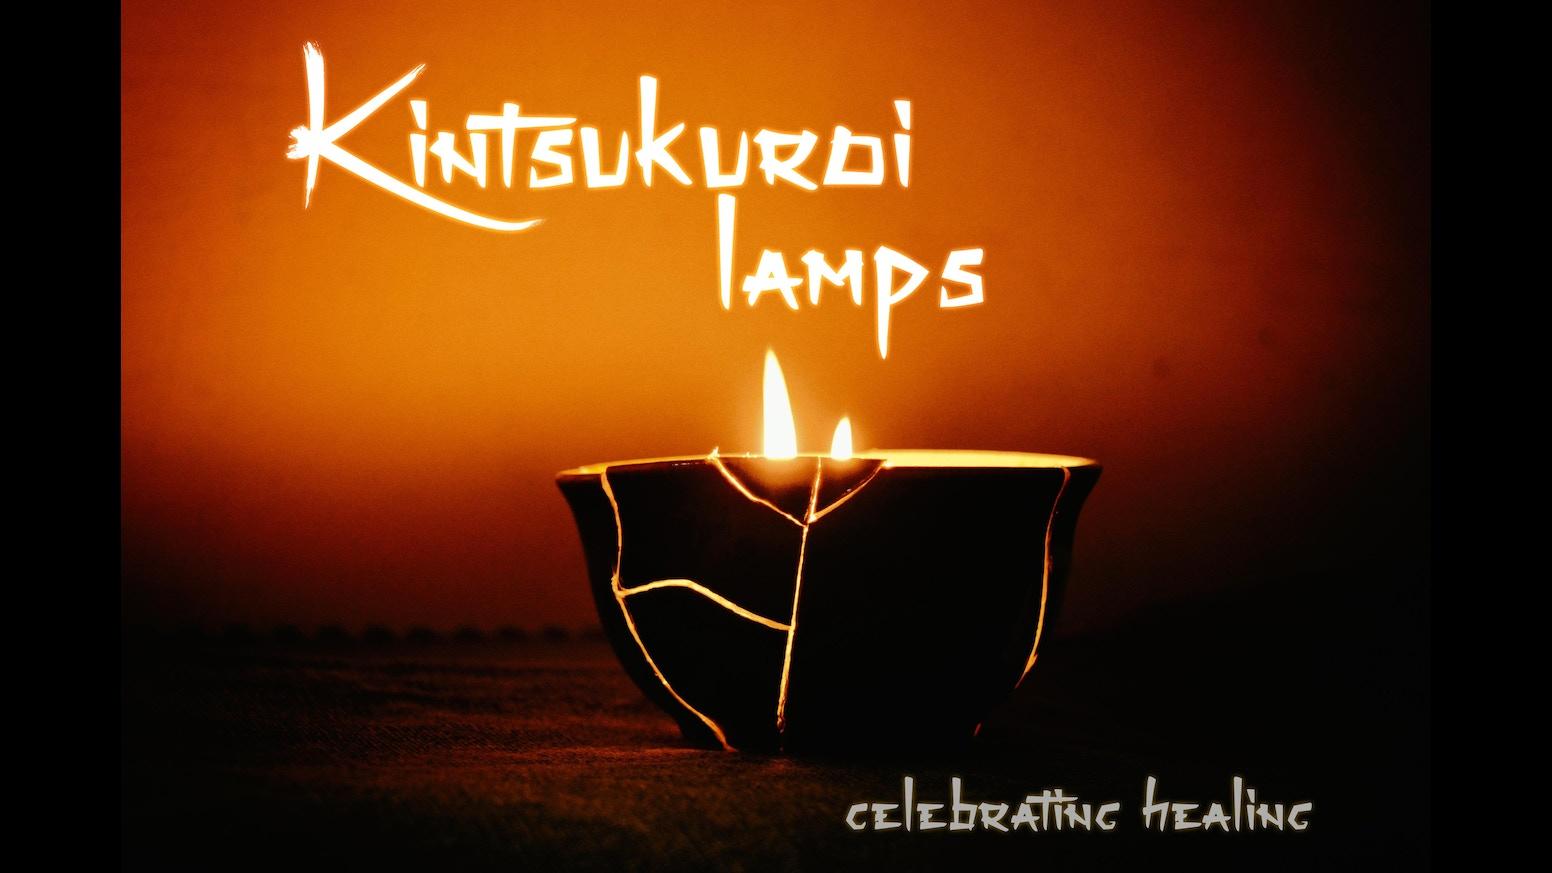 Kintsukuroi Lamps Celebrating Healing By Kintsugi Lamps